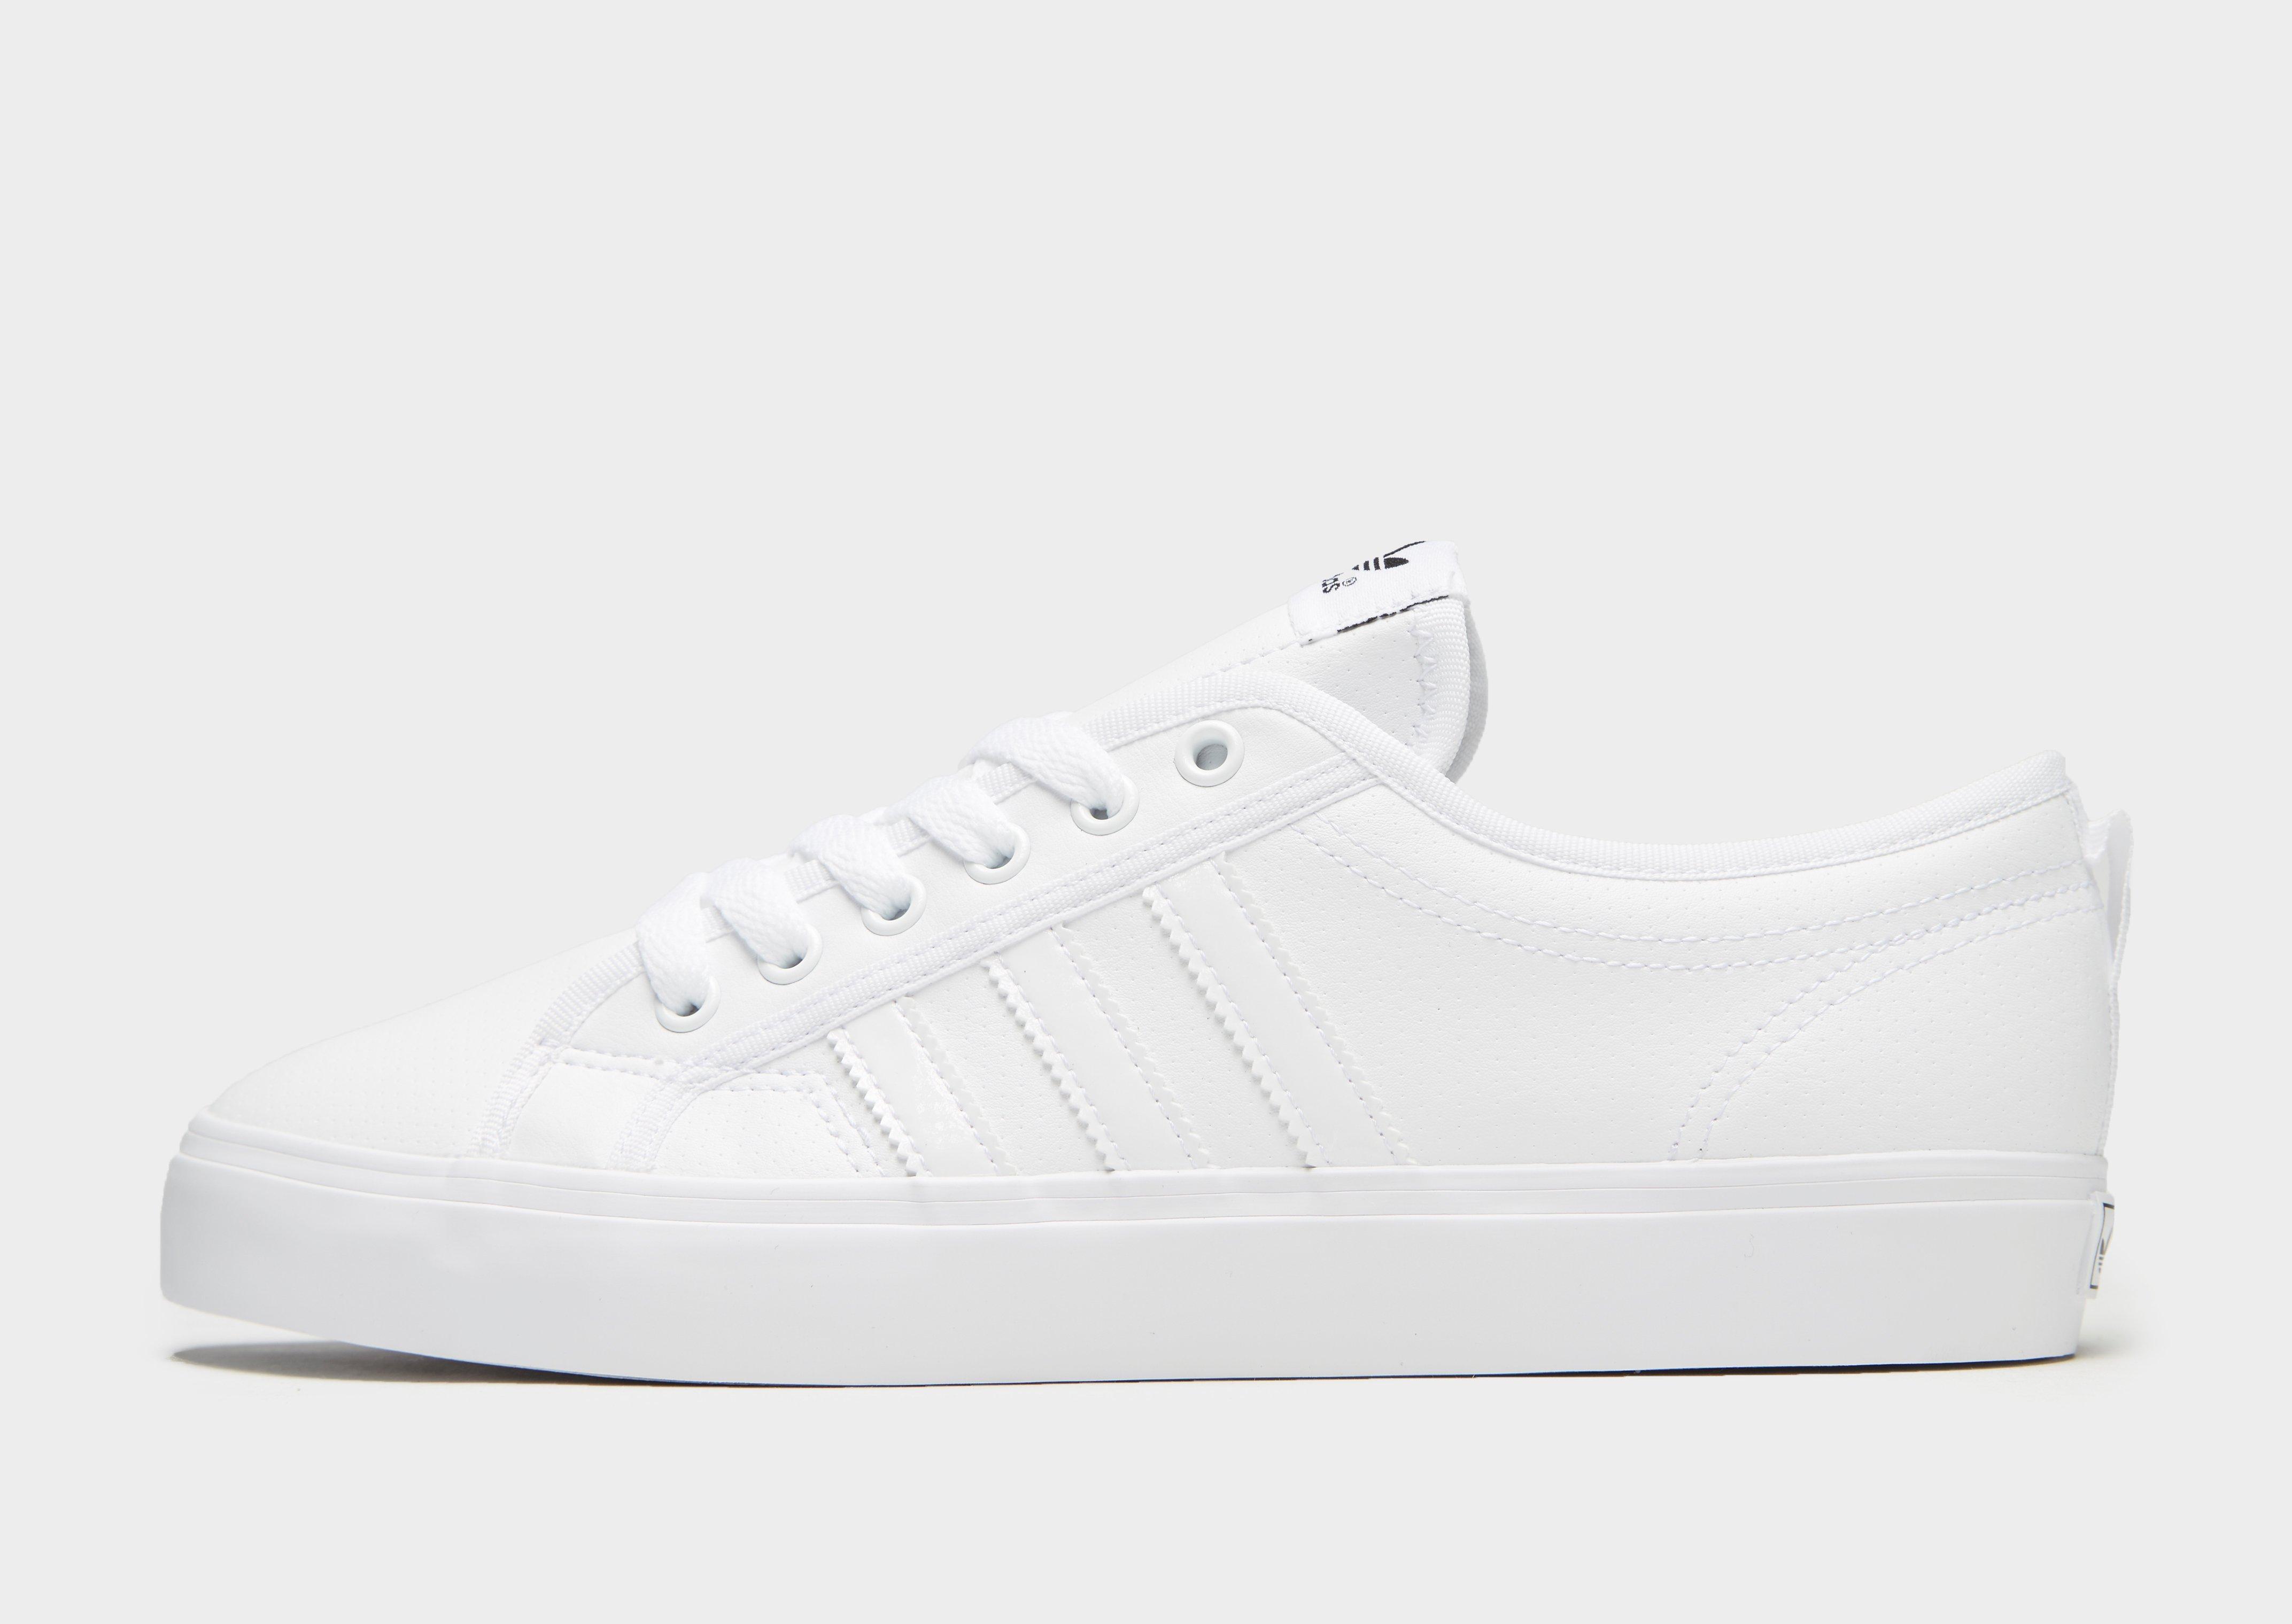 Chaussures Baskets Adidas Nizza Lo Black Noir jR0dO7BaSq